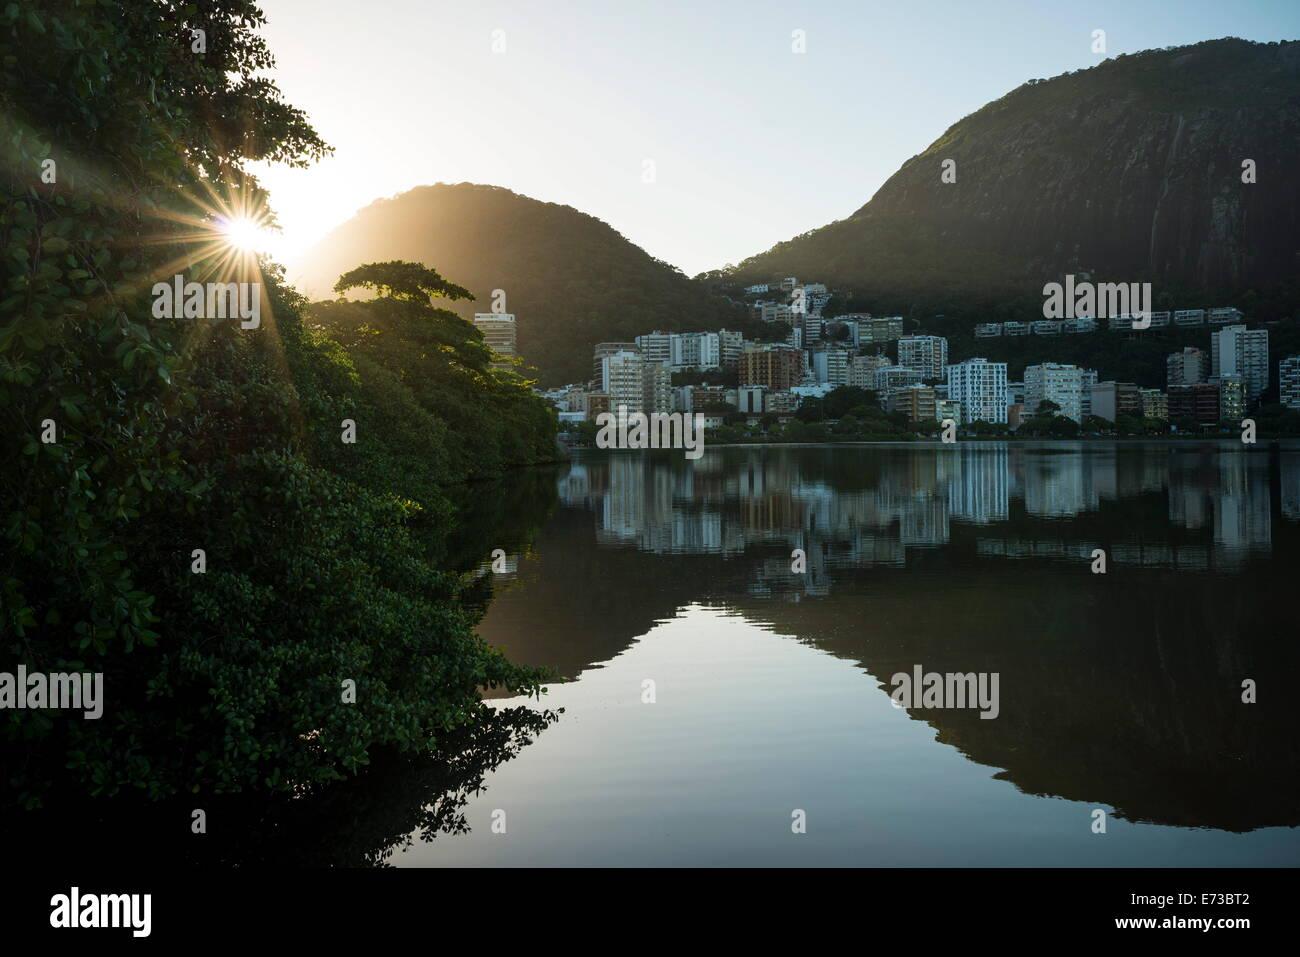 Early morning light on the Lagoa Rodrigo de Freitas, Rio de Janeiro, Brazil, South America - Stock Image